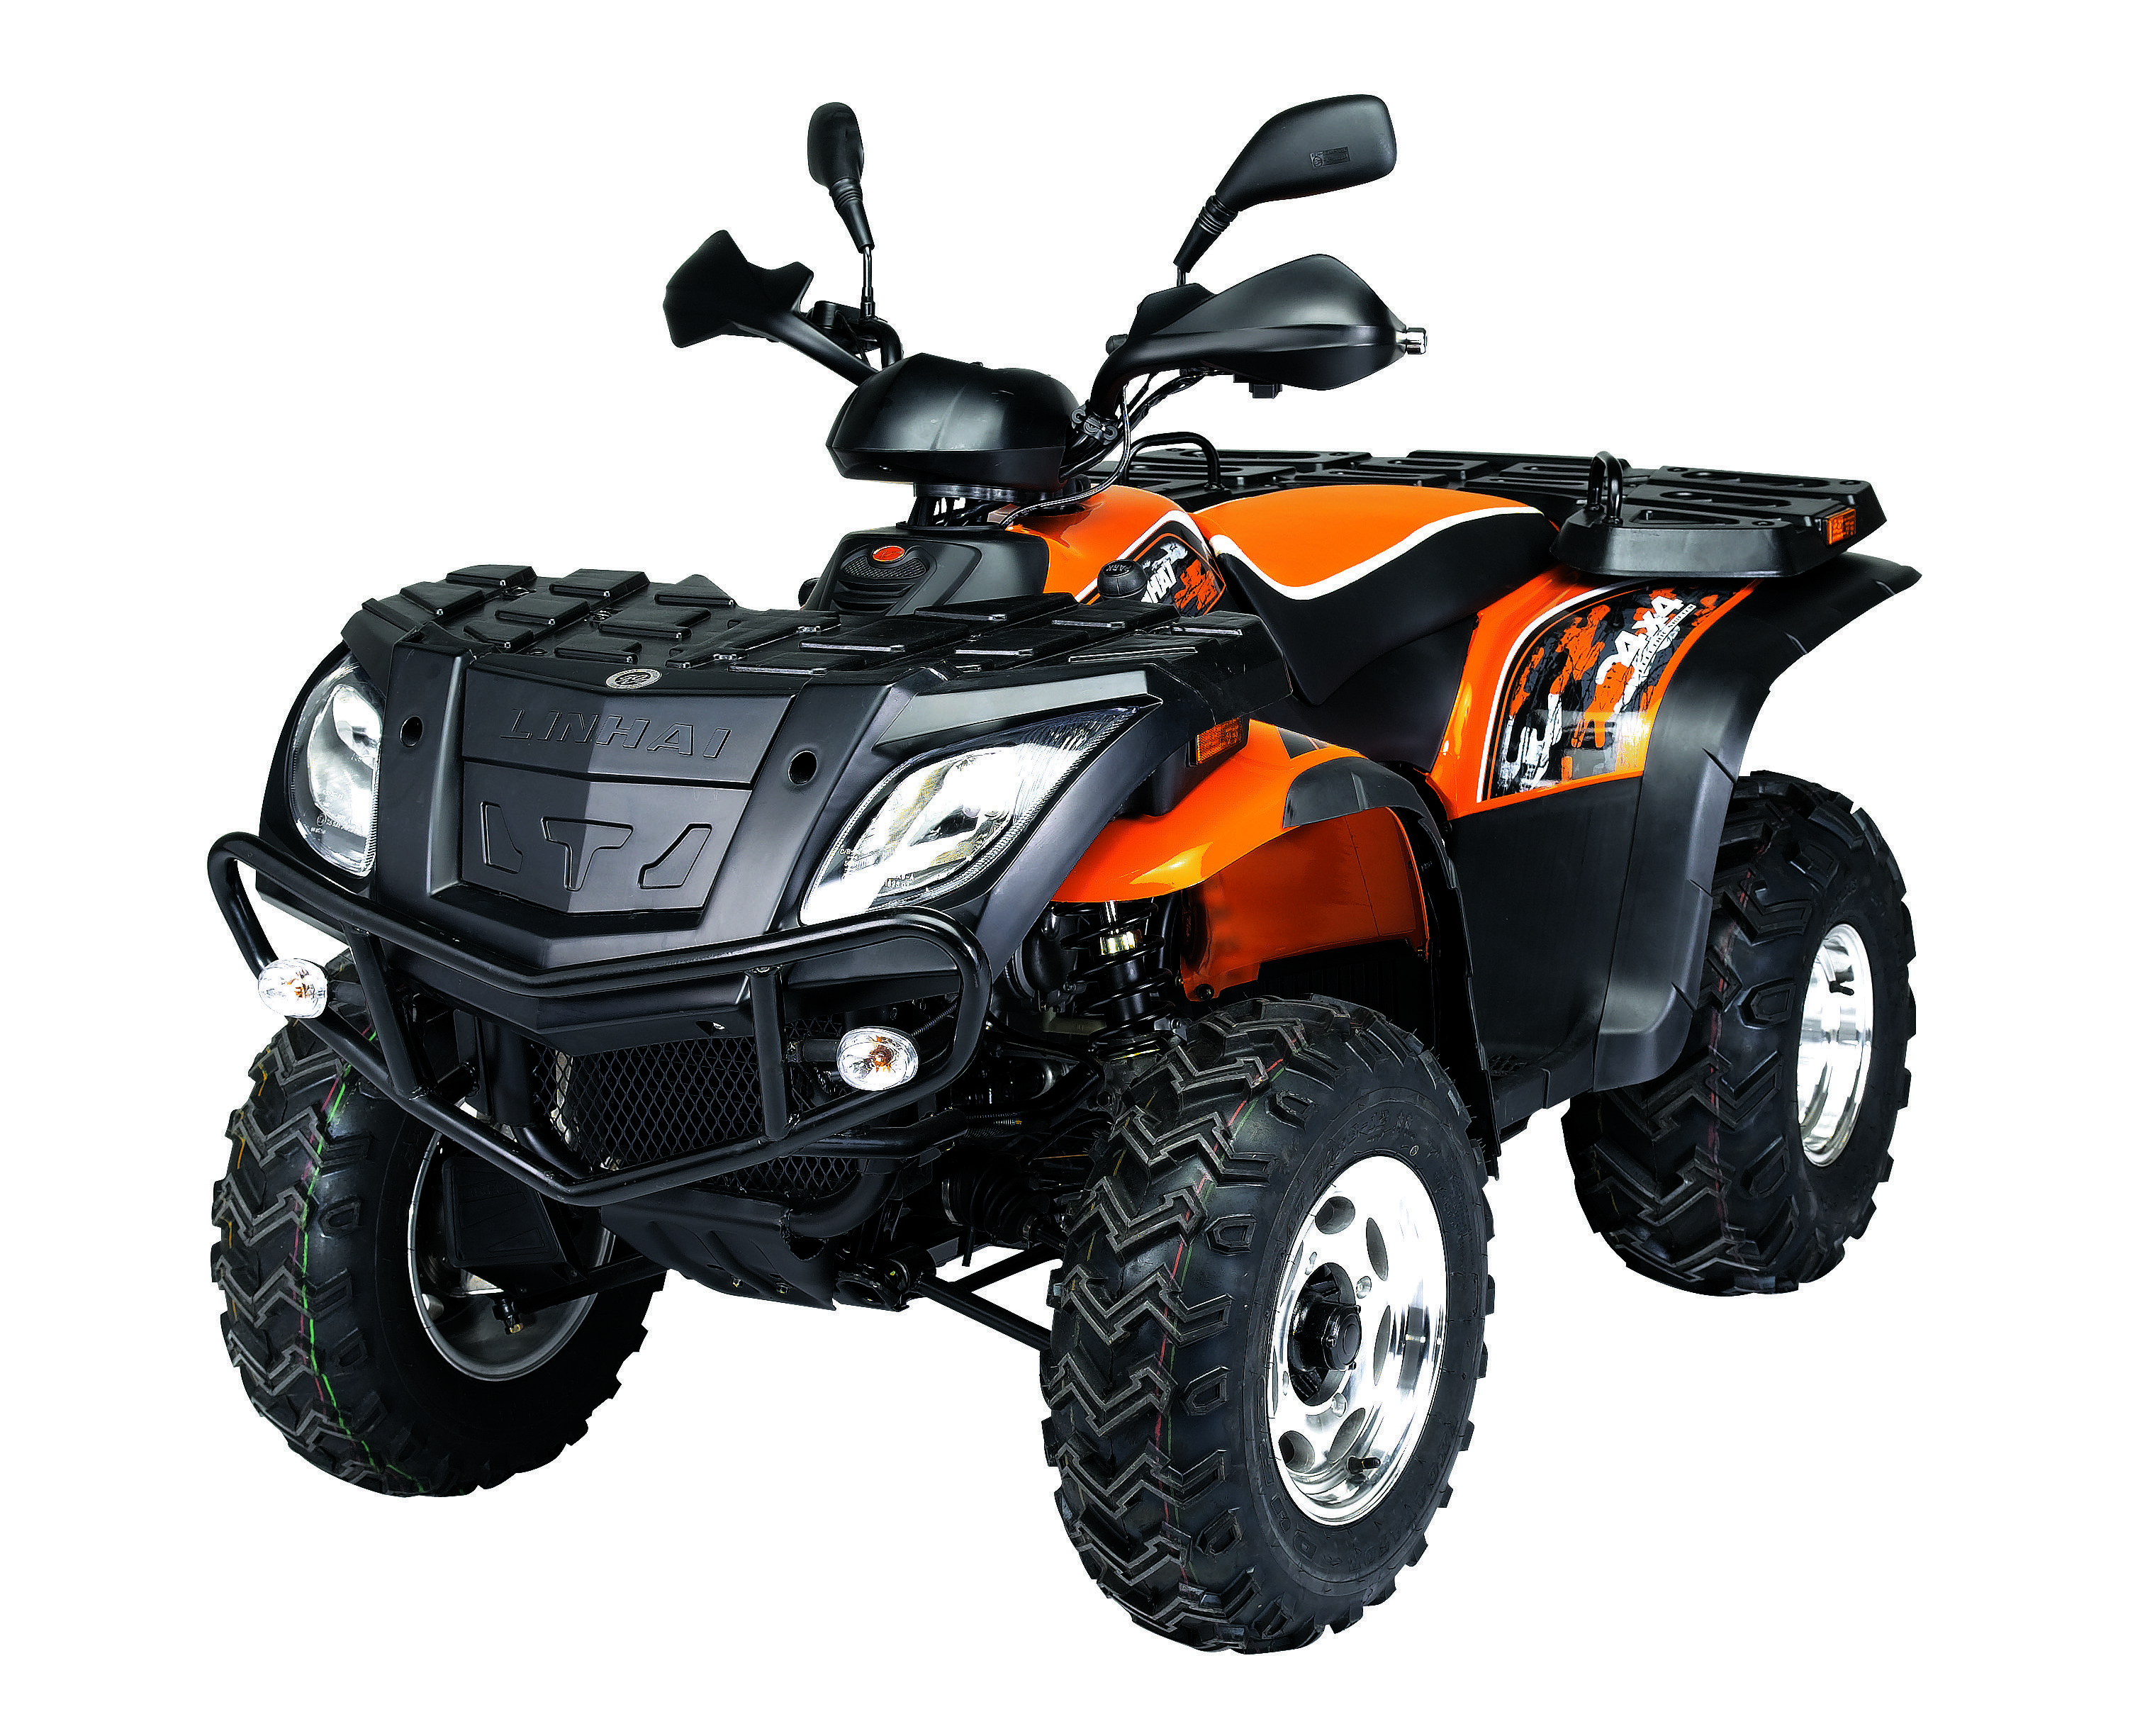 Linhai Bighorn 400SE 4x4 ATV